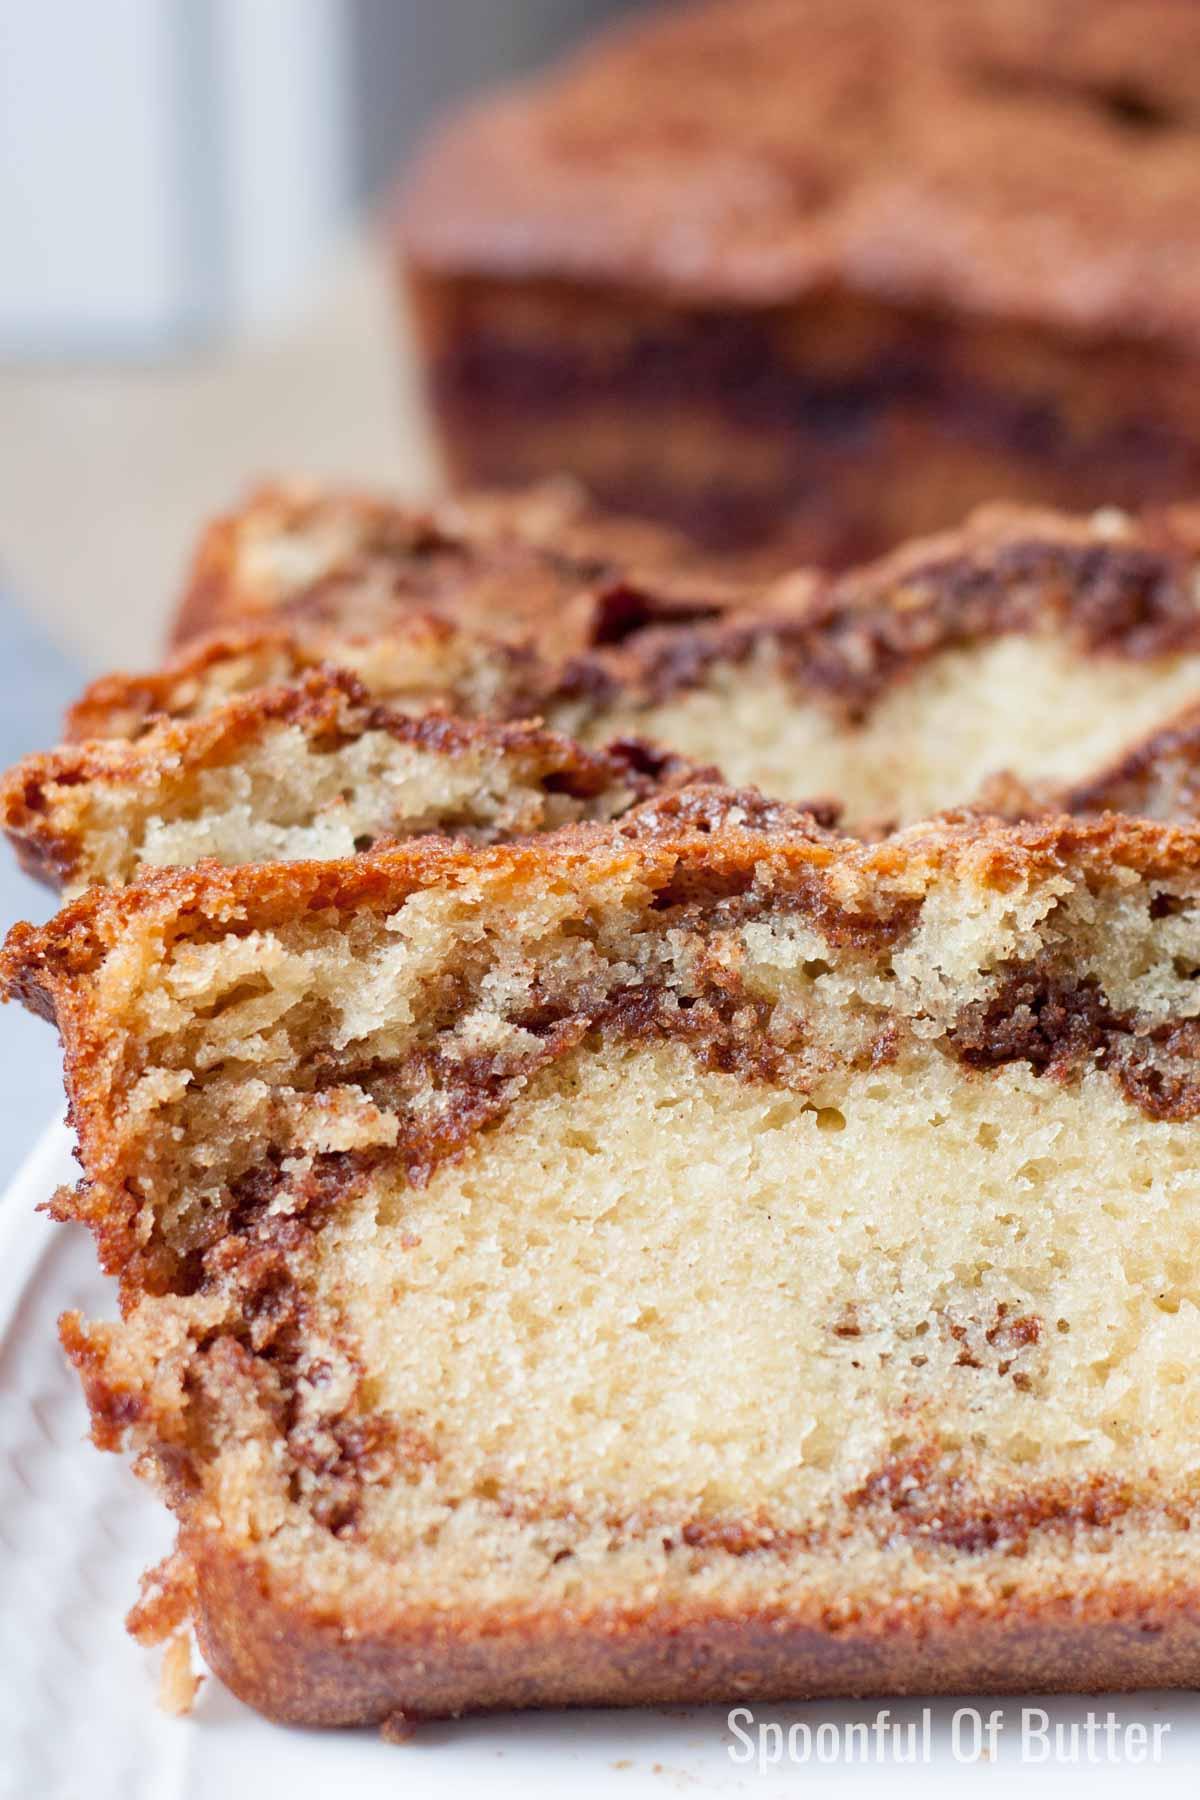 A slice of super moist cinnamon swirl loaf